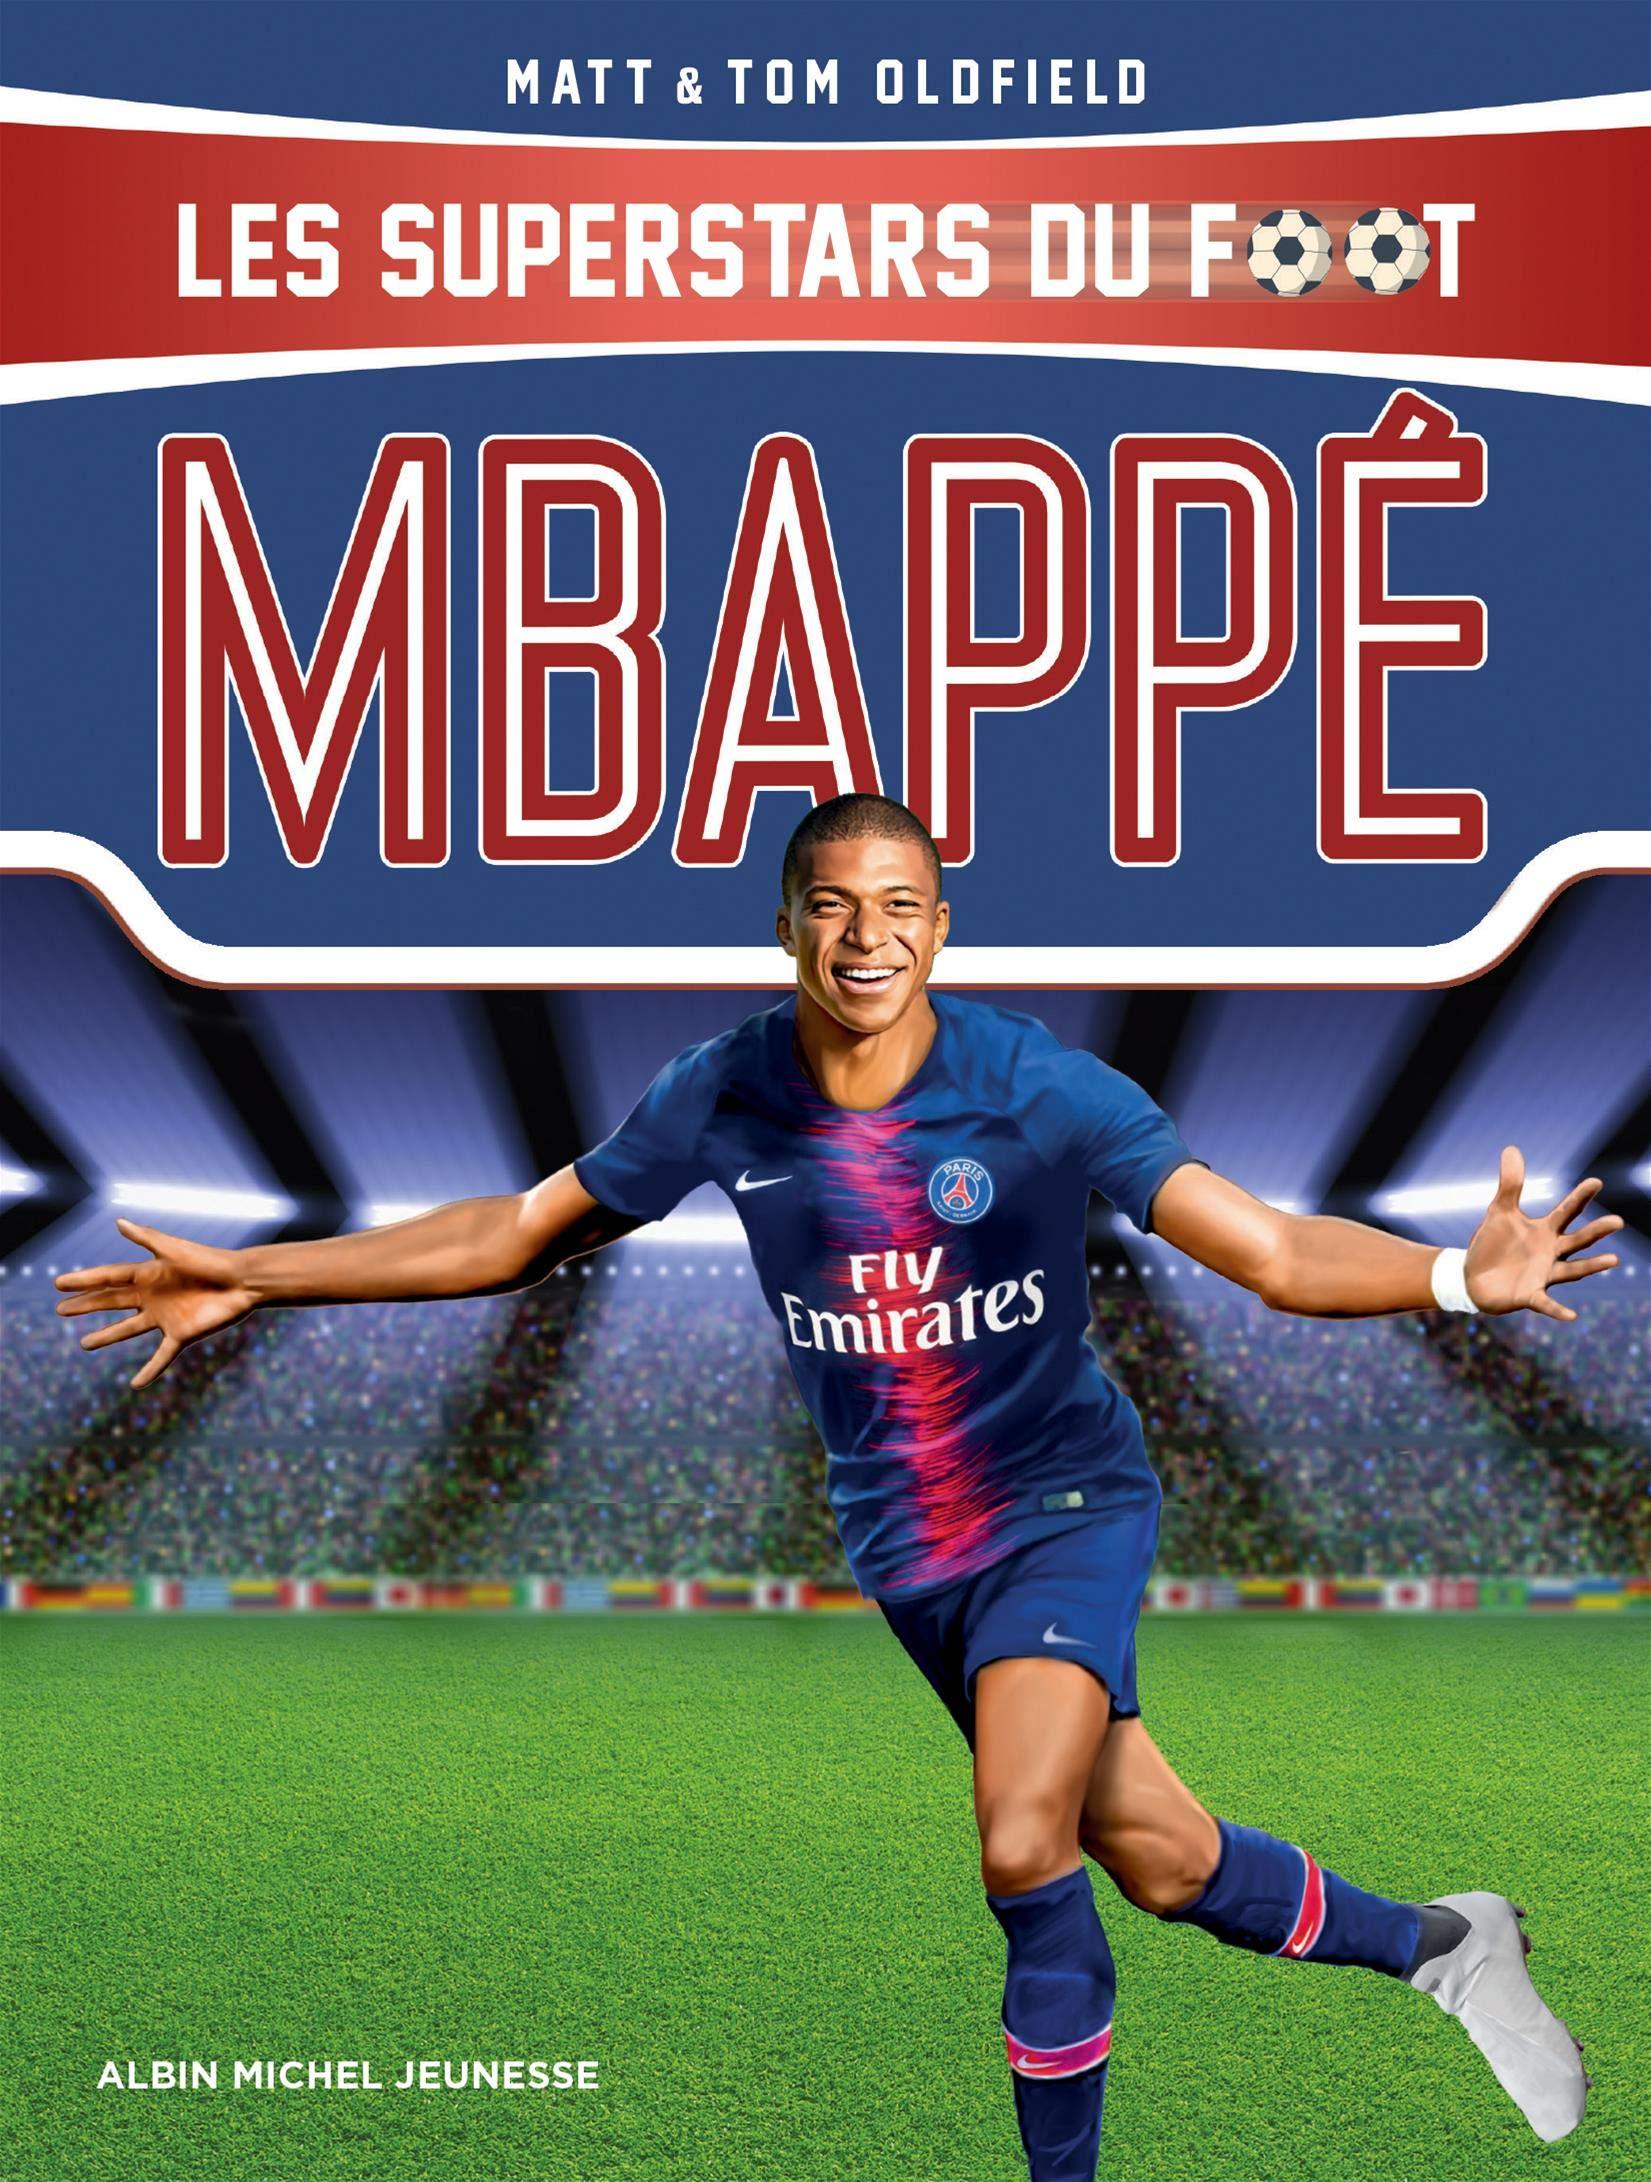 Mbappé: Les Superstars du foot (AM.SUPERST.FOOT) (French Edition ...